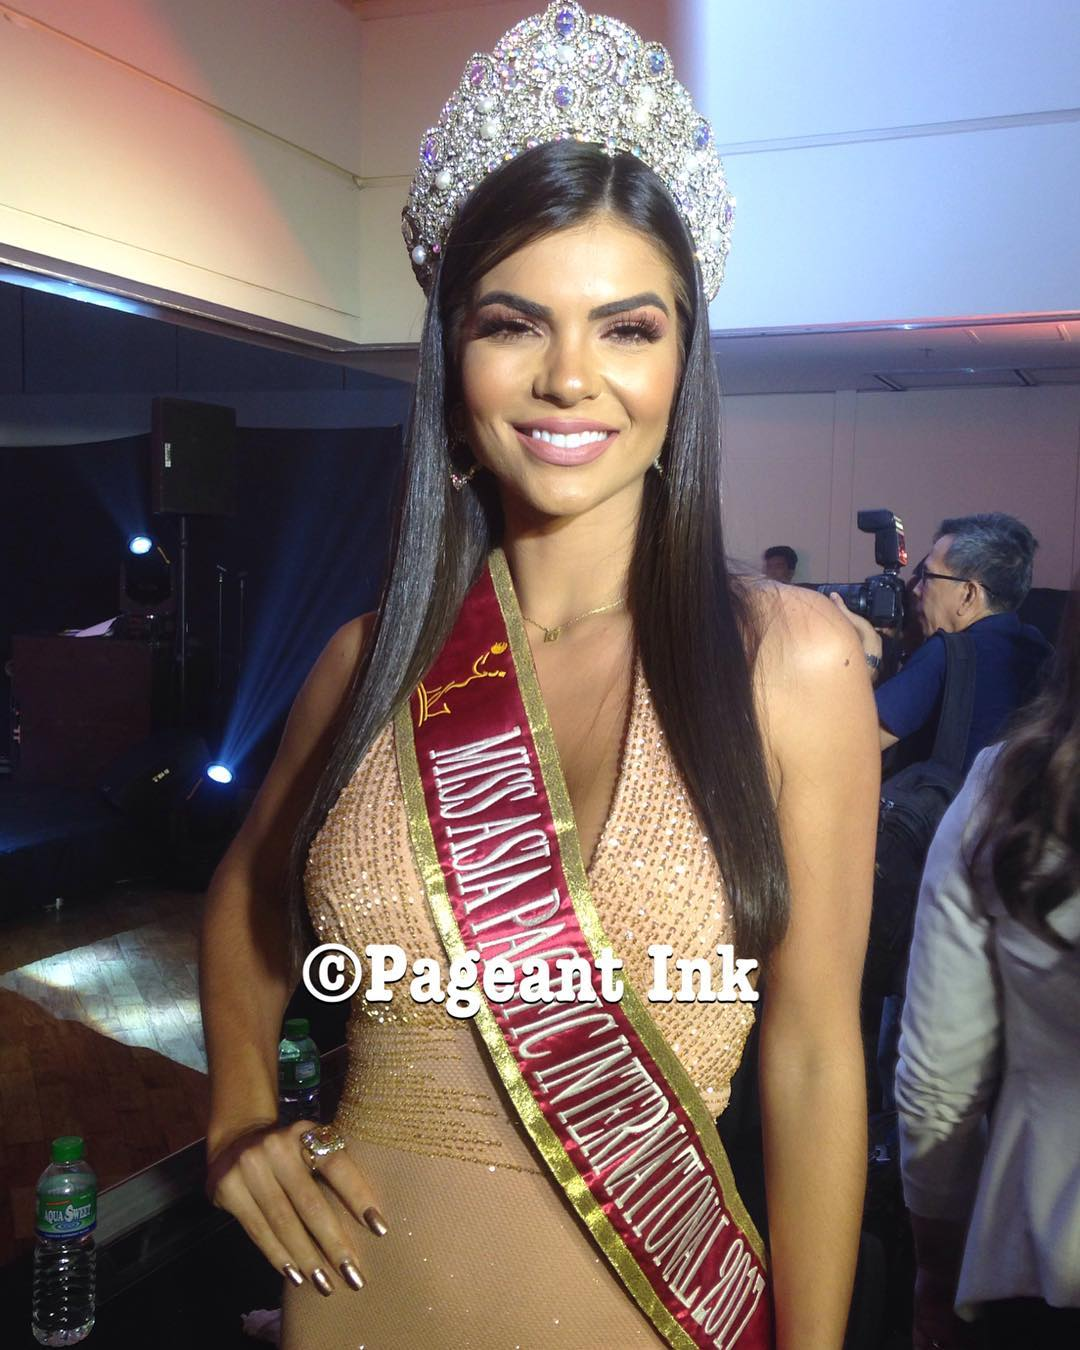 MISS ASIA PACIFIC INTERNATIONAL 2017/MISS PANAMERICAN INTERNATIONAL 2018. - Página 5 40723211